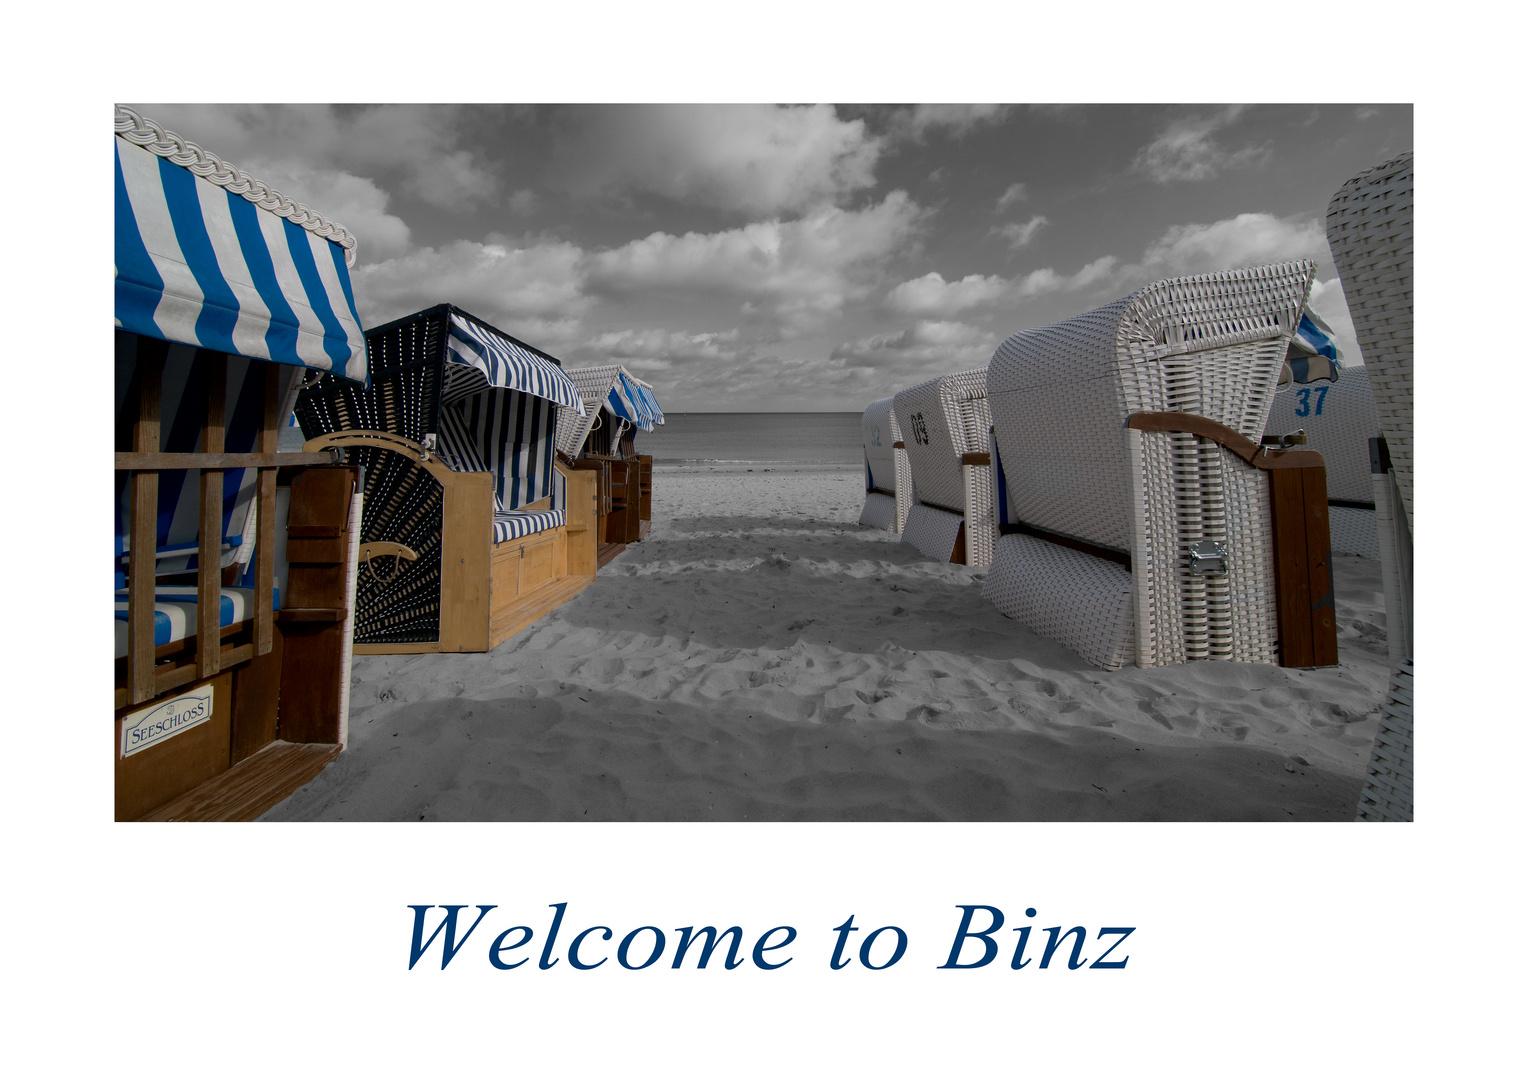 Welcome to Binz